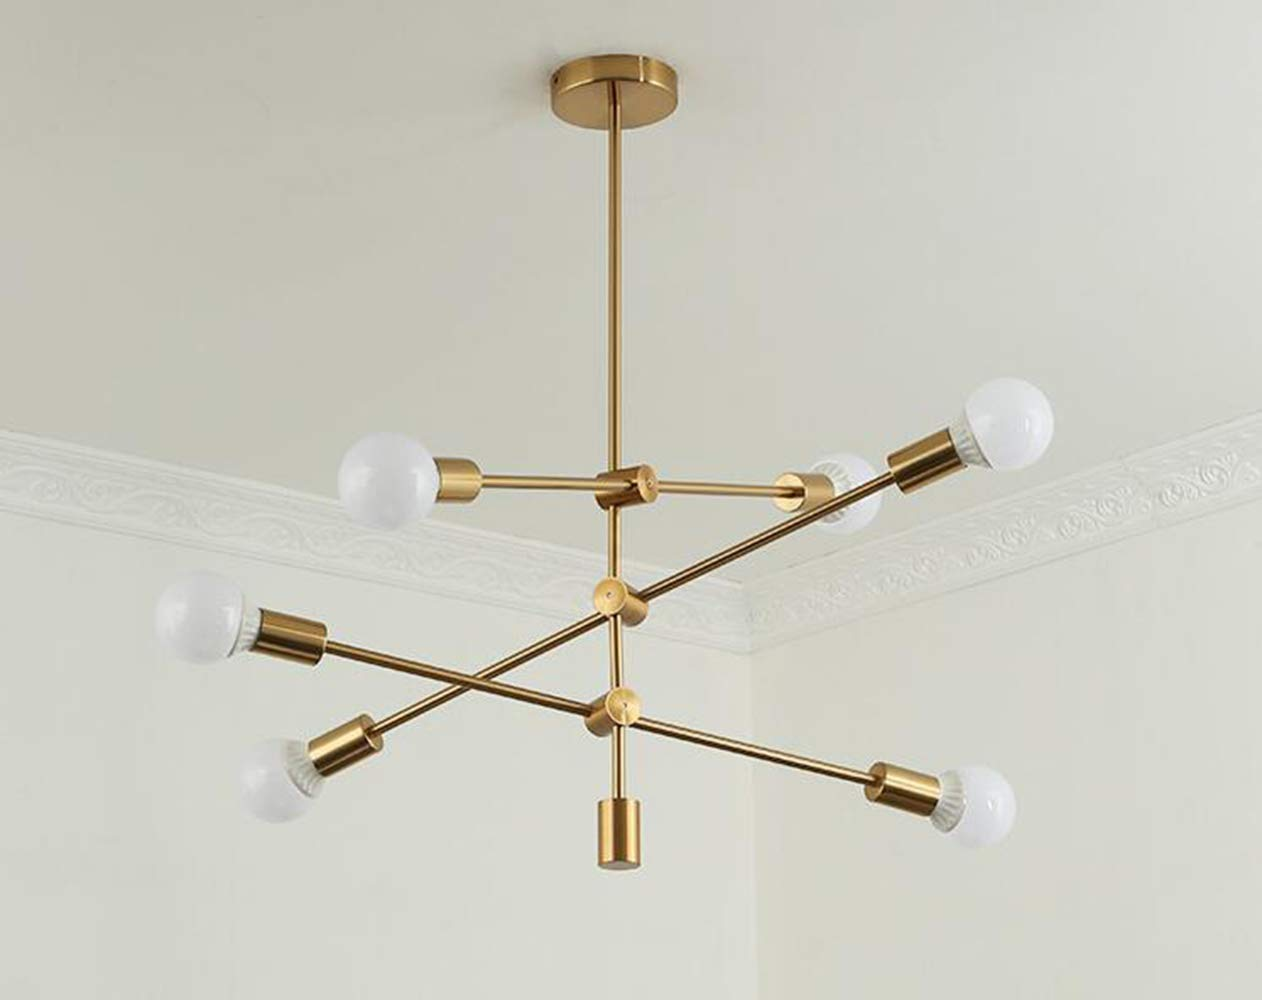 Plafoniere Industriali Usate : Lampade a sospensione industriali usate: lampada in ottone spoutnik